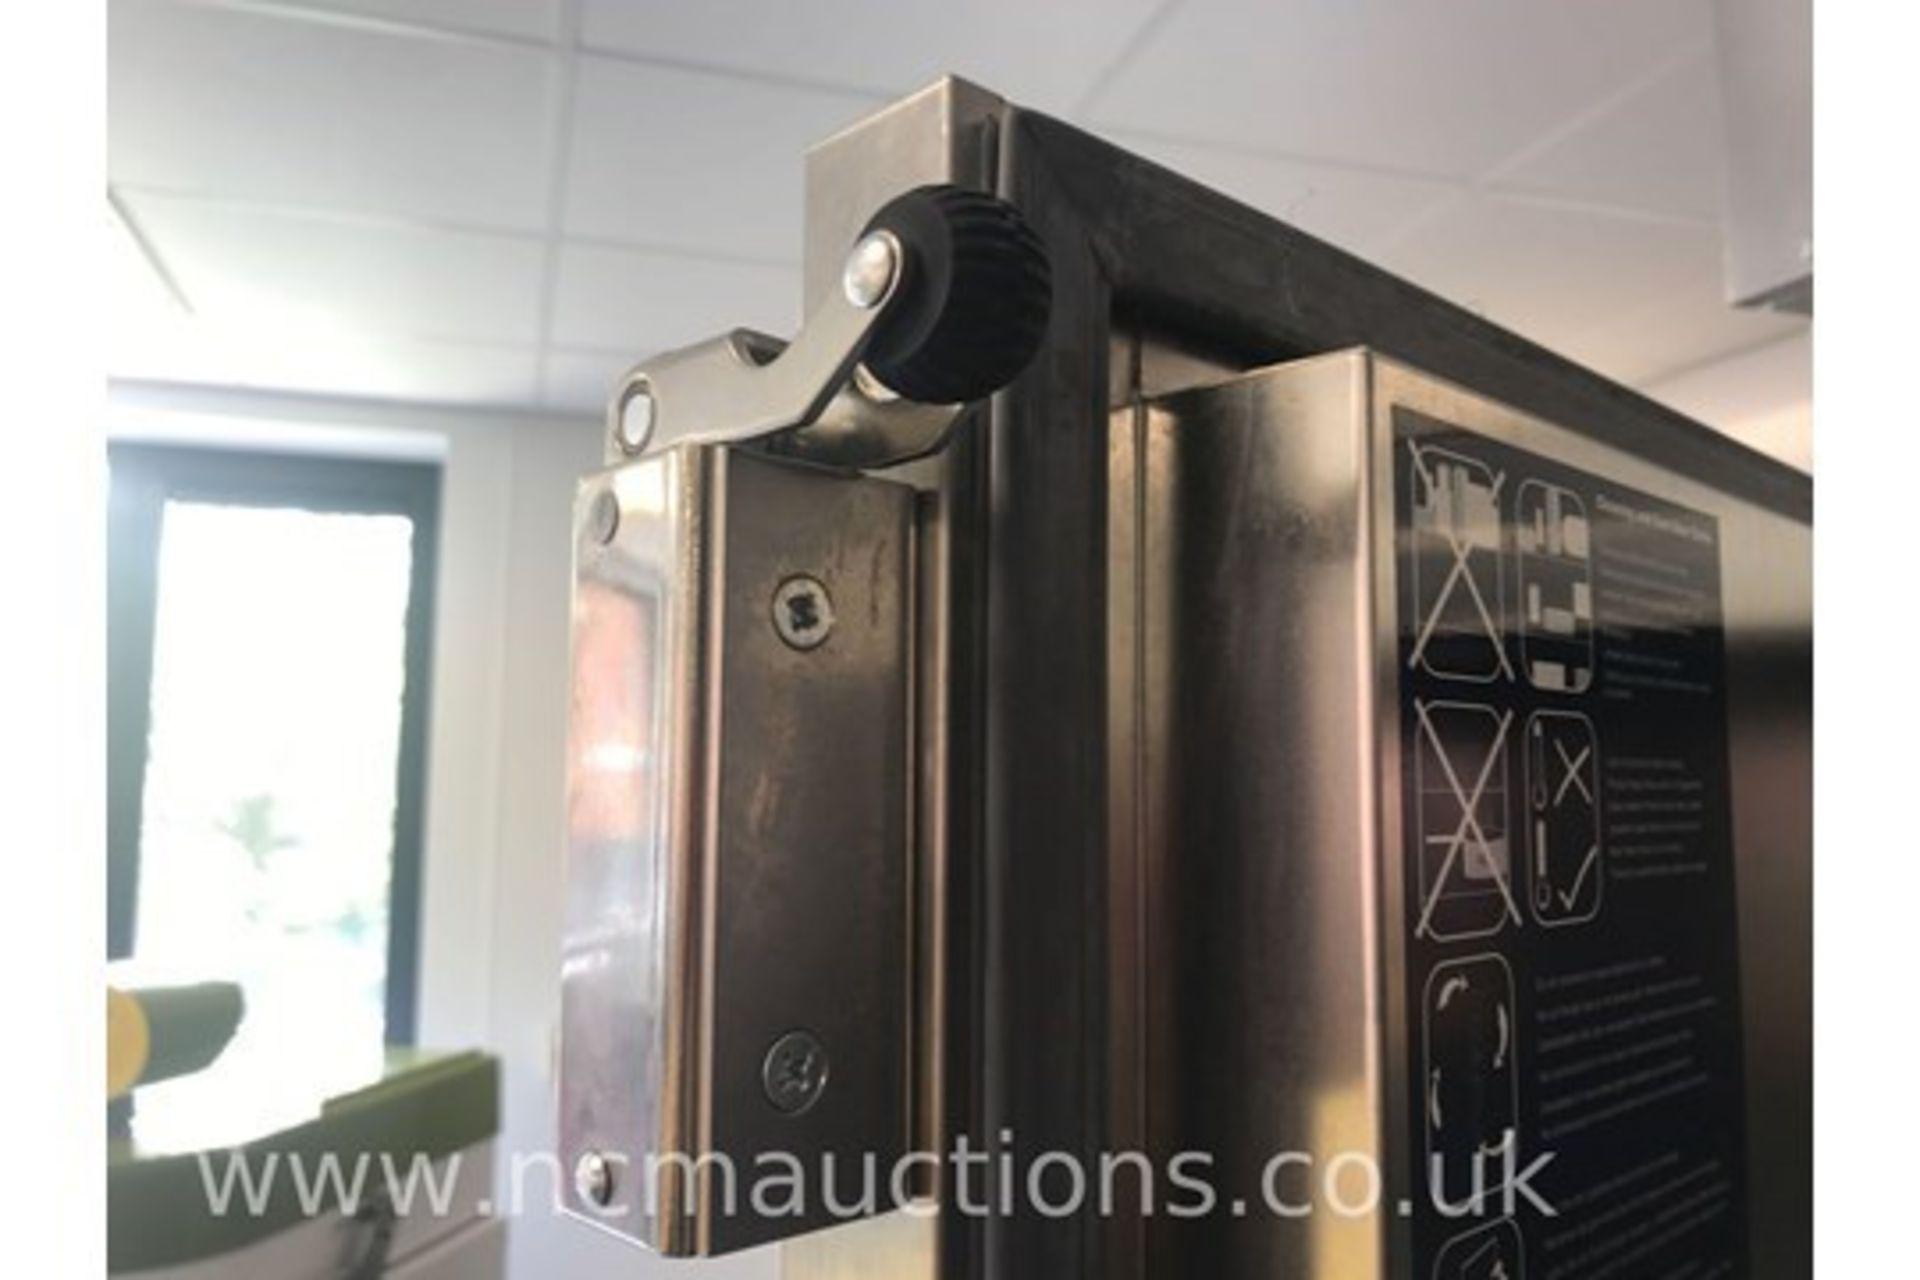 Lot 11 - Williams Refrigeration Bakery Prover